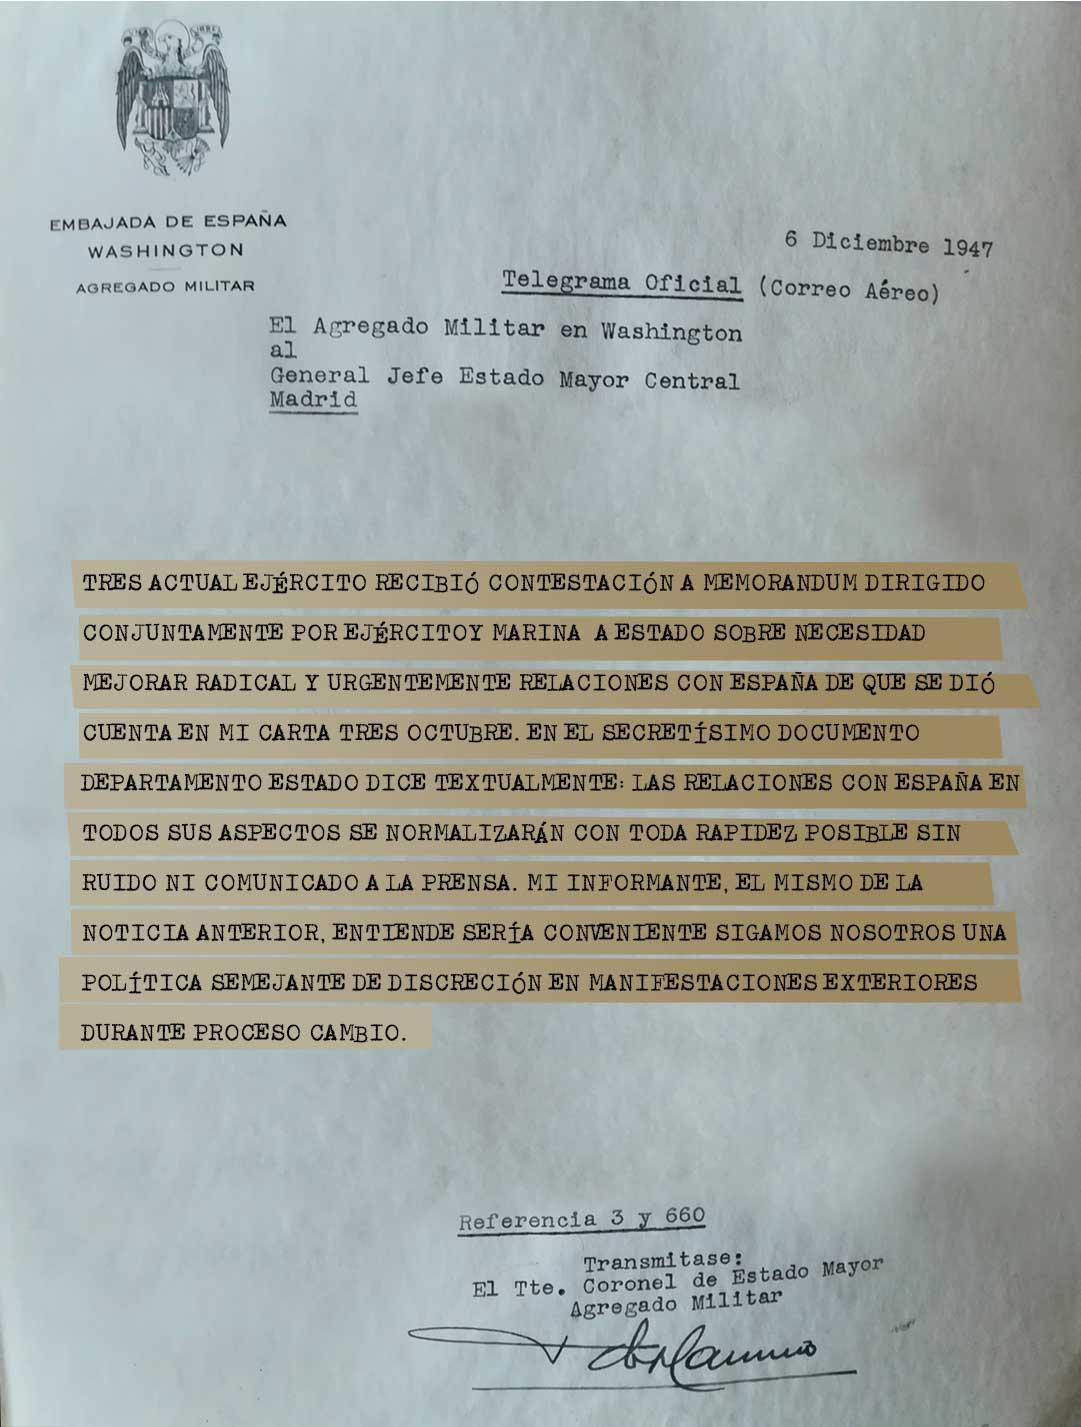 documento decodificado